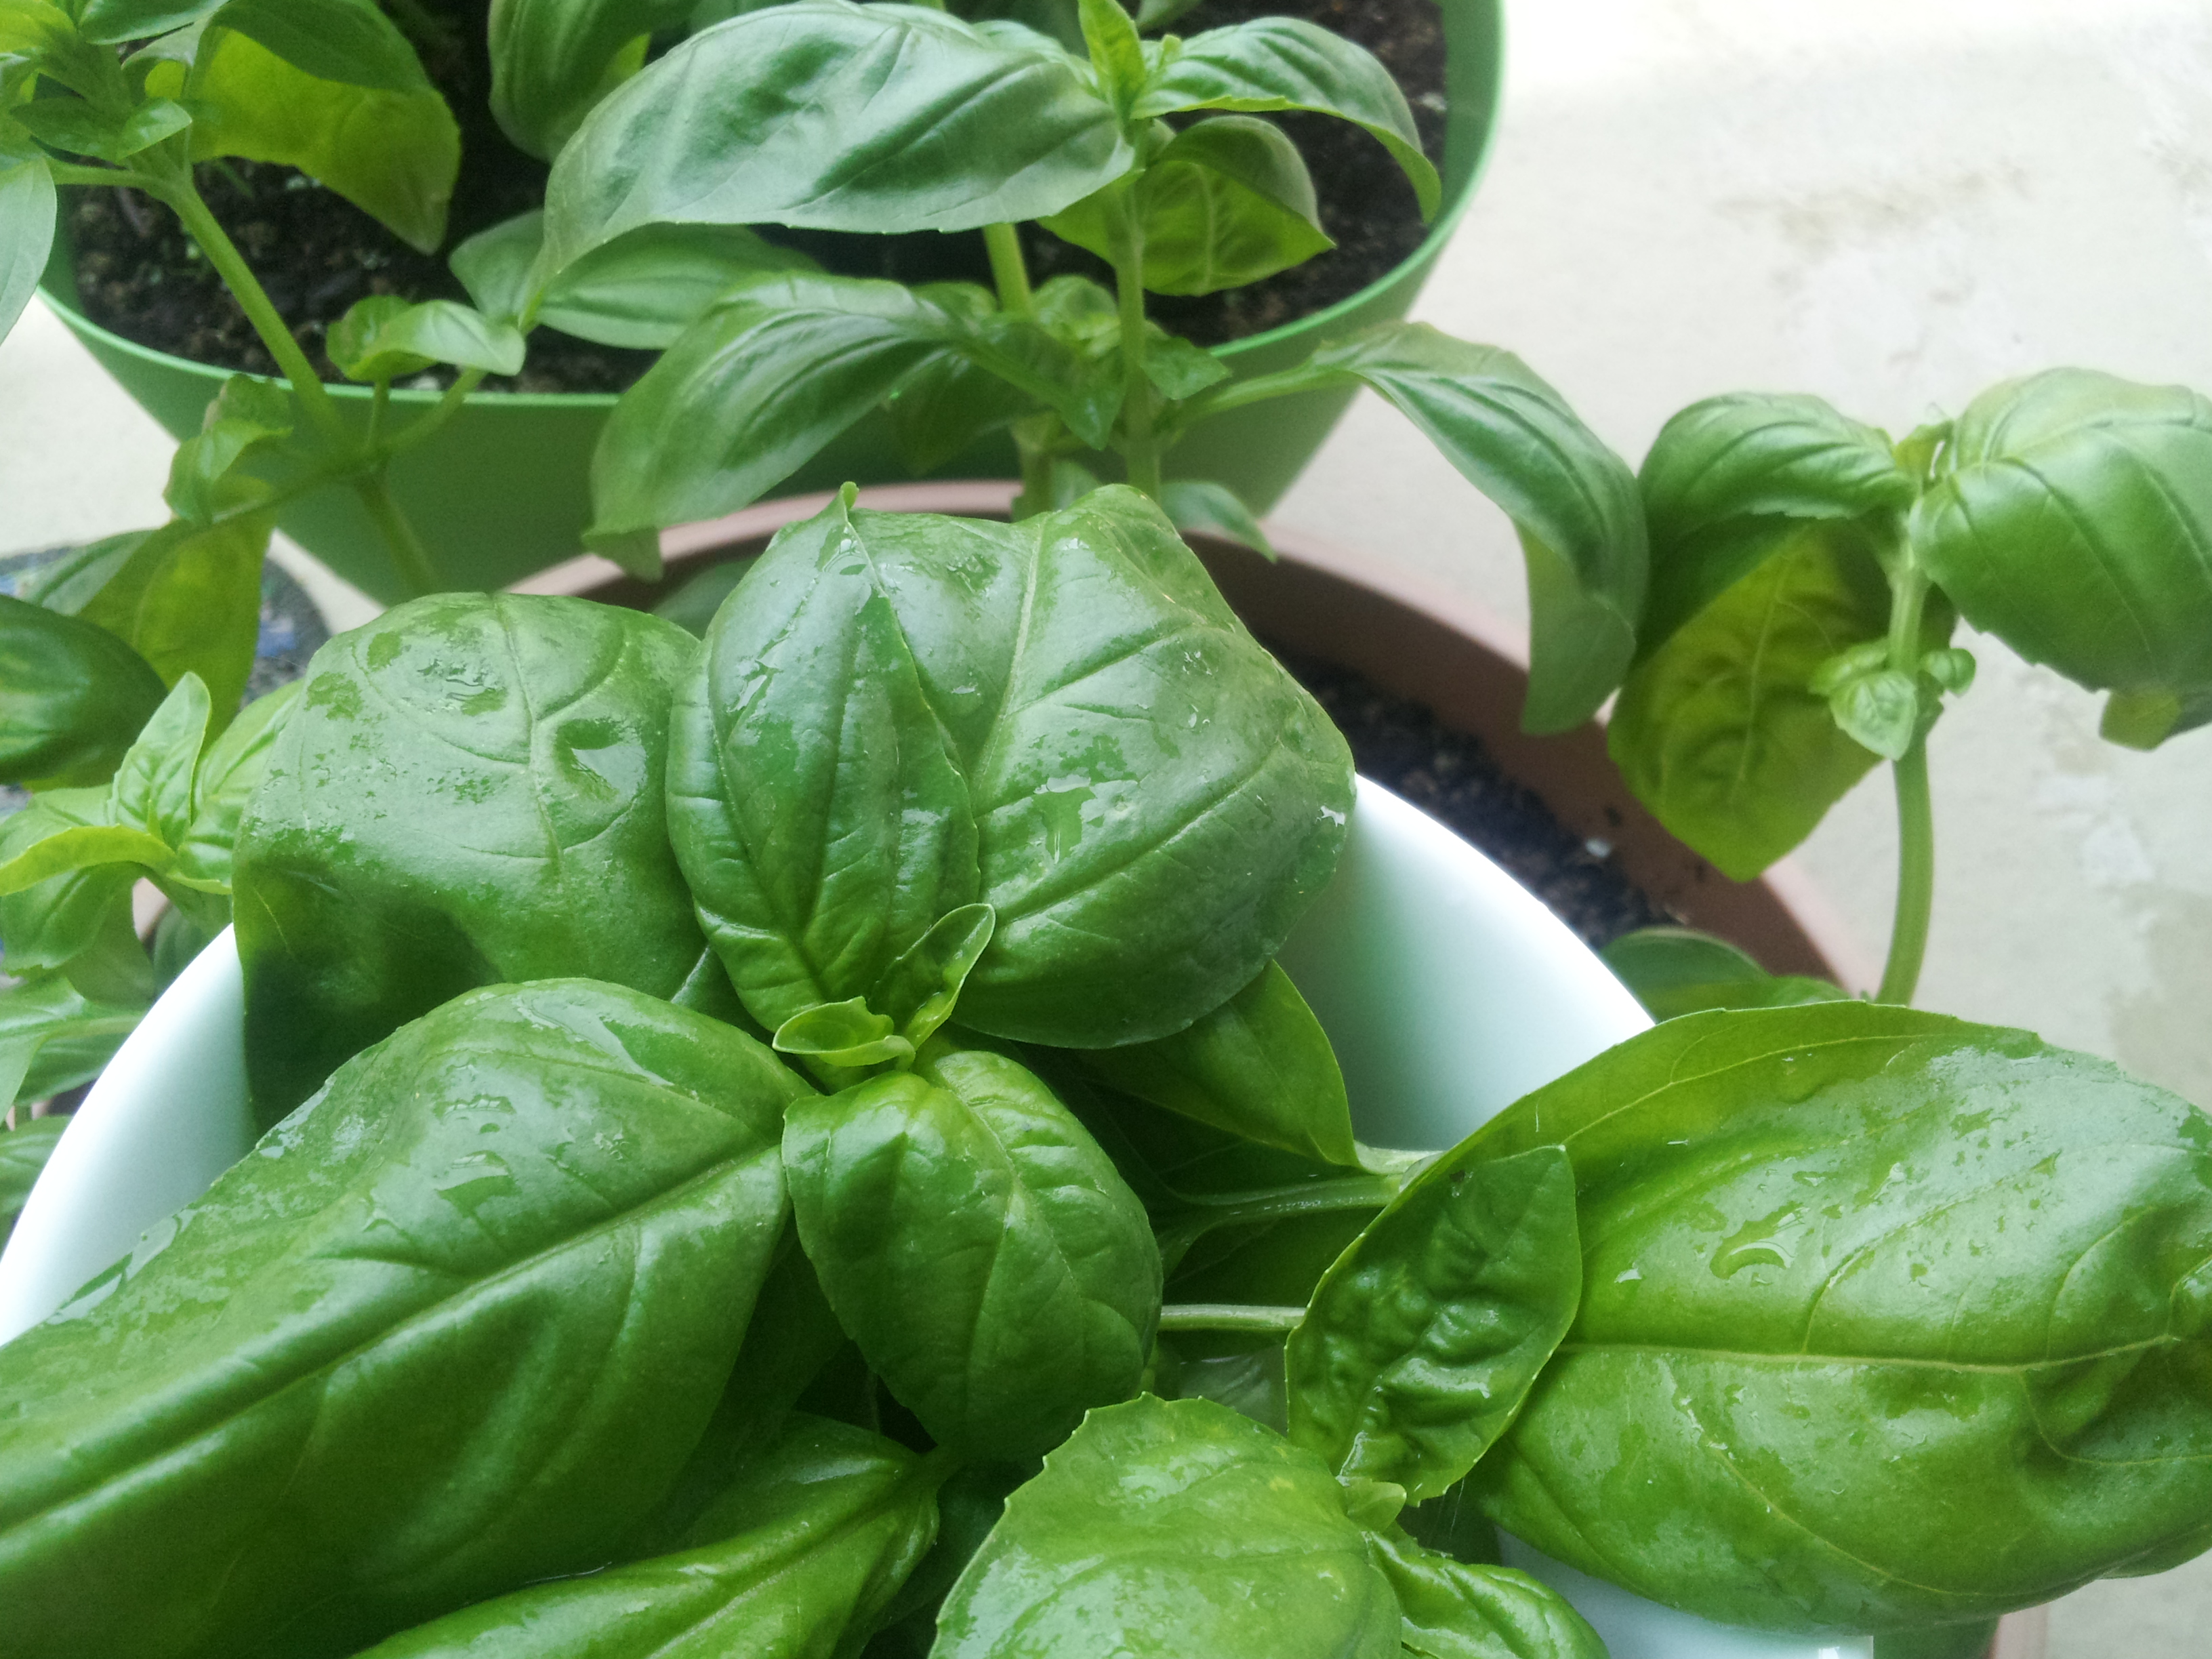 Mojito basilic basilic en ville articles - Basilic seche a ne pas consommer ...